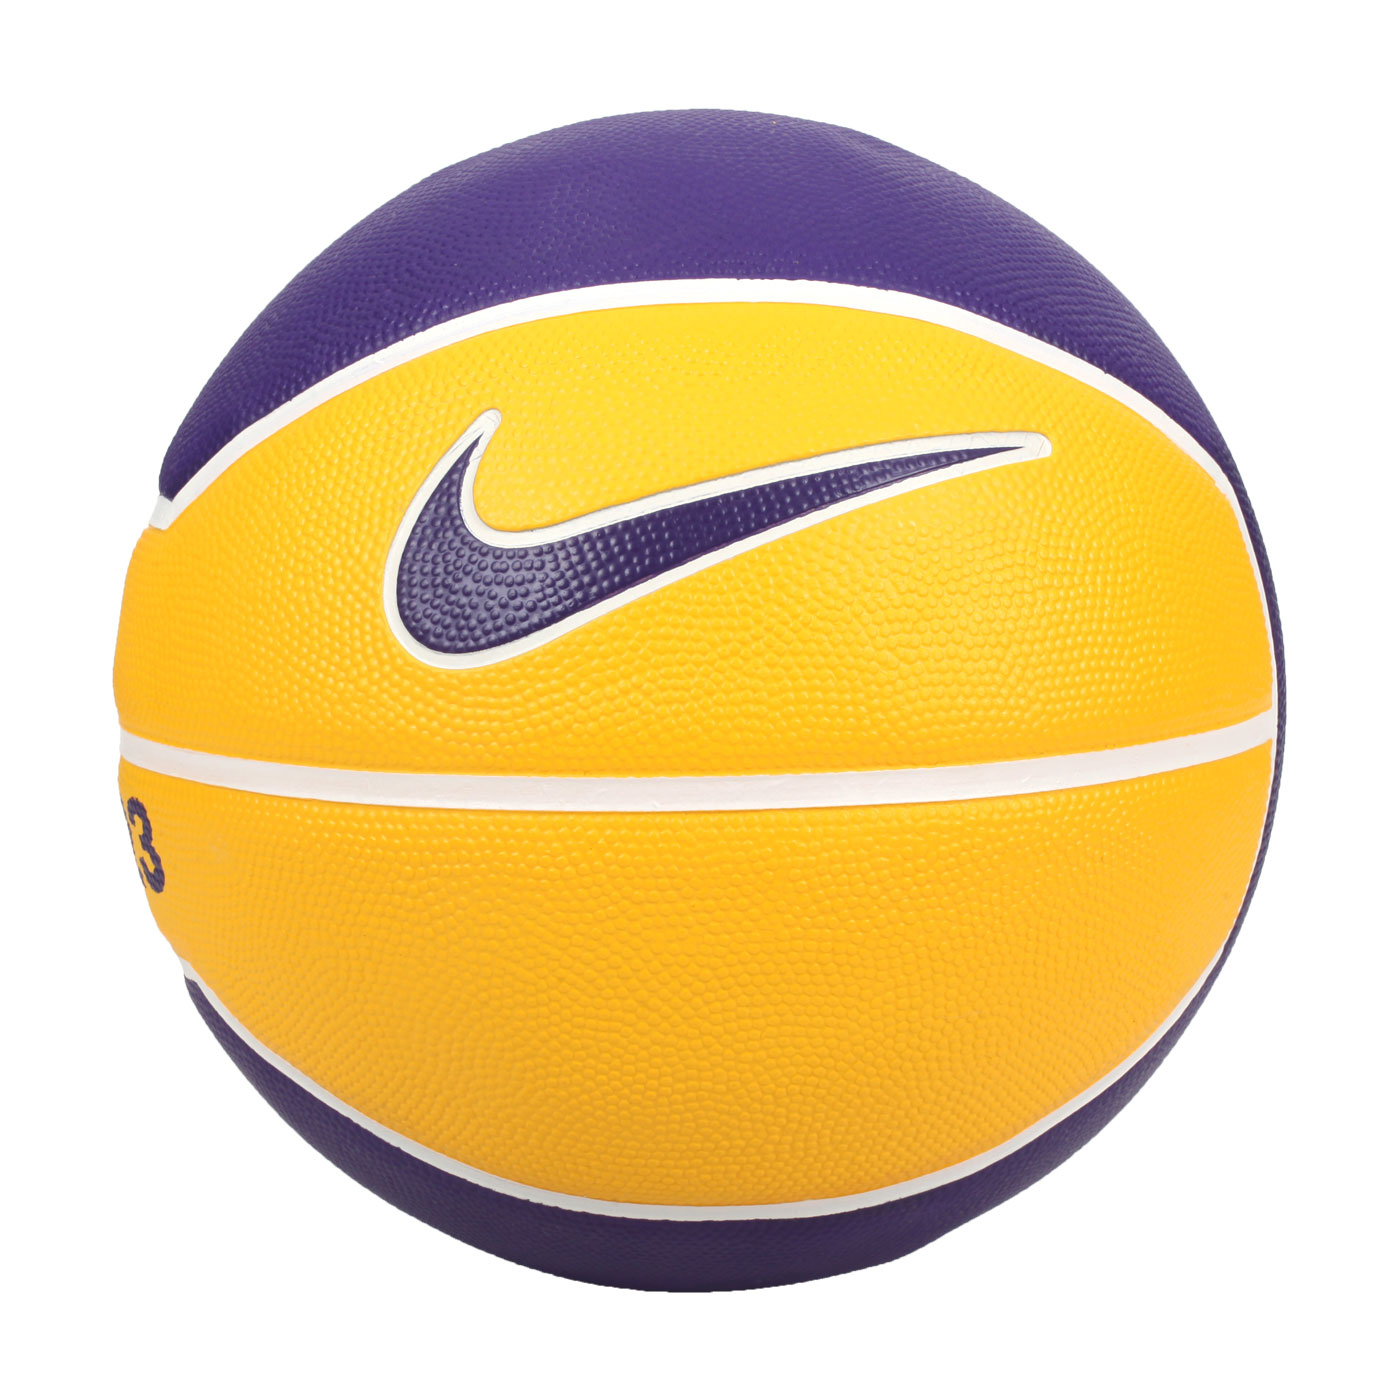 NIKE LEBRON PLAYGROUND 4P 7號籃球 N000278472807